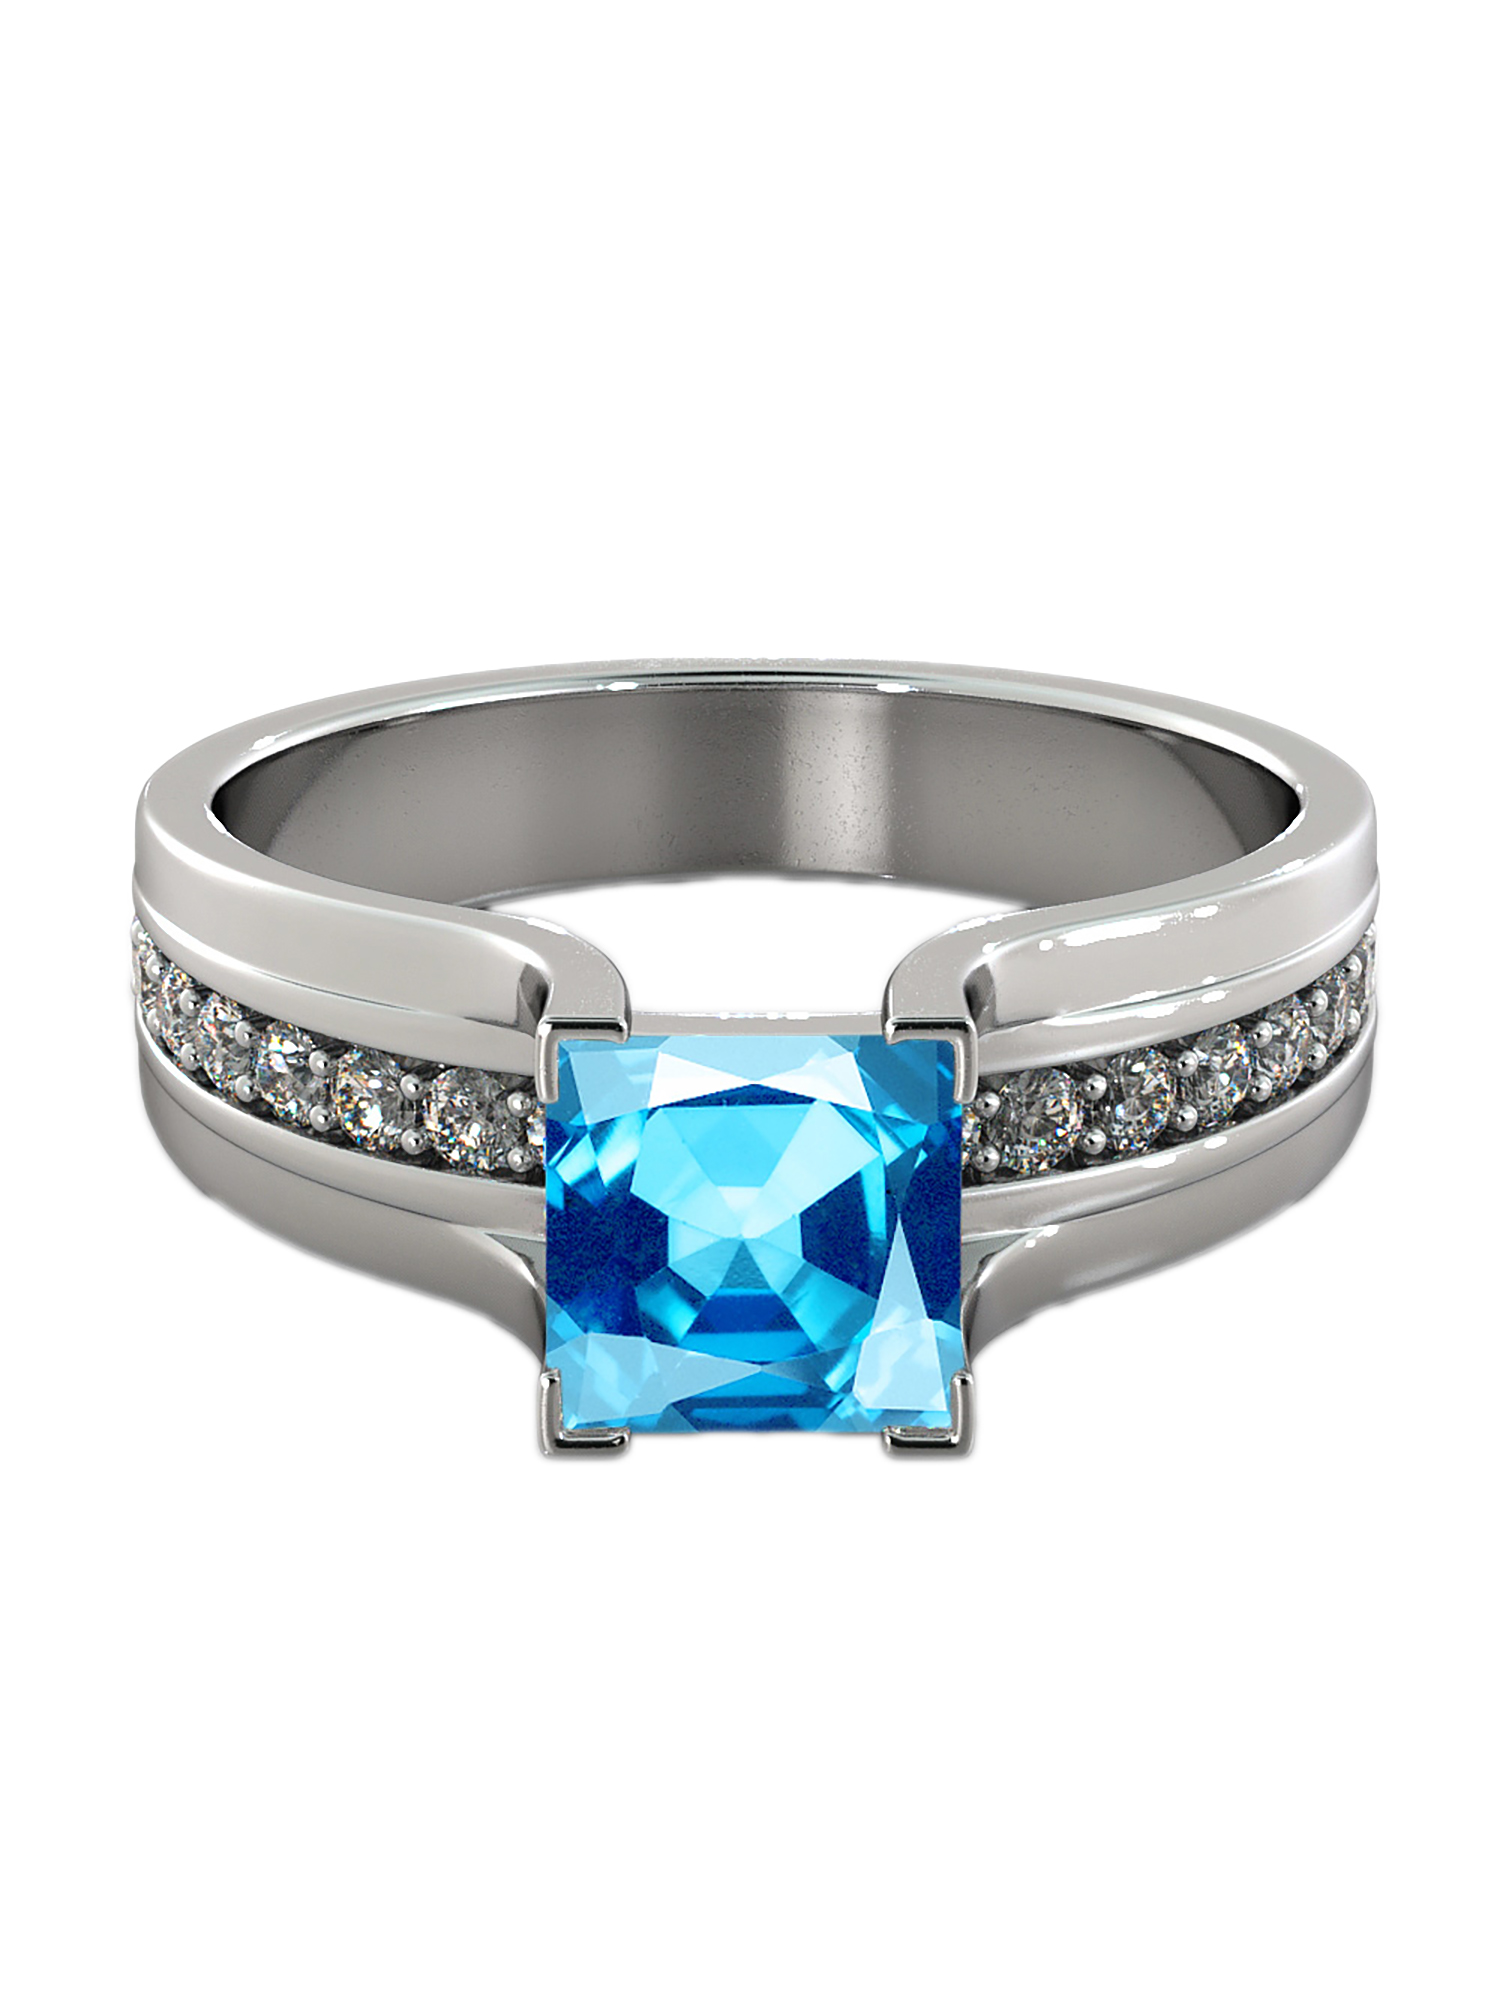 Aquamarine 5.20 ctw Ring with Diamonds 14K White Gold Bridge Channel set Princess by Diamonds Mine